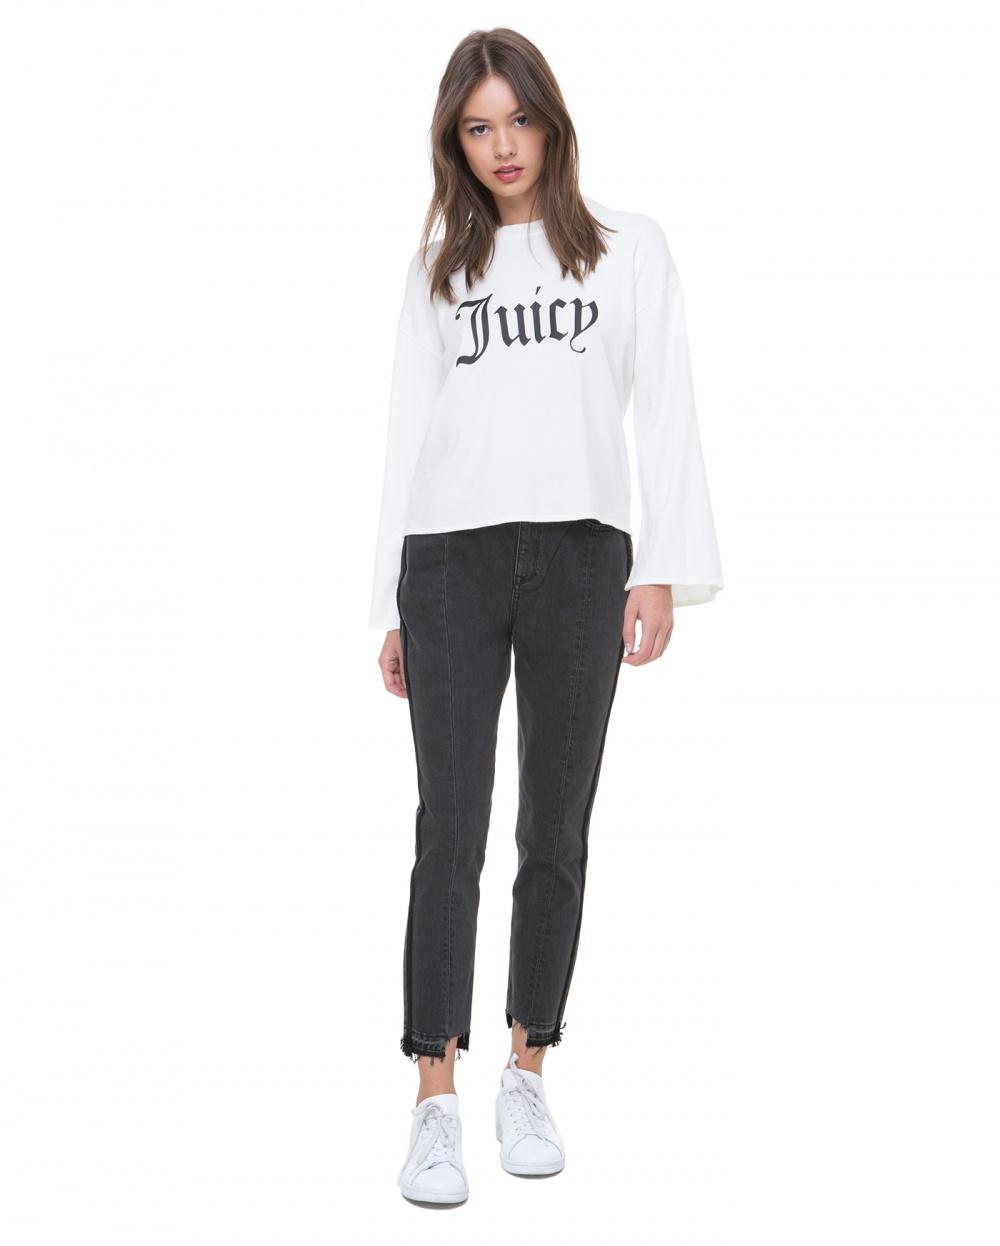 Джинсы Juicy Couture, размер 30